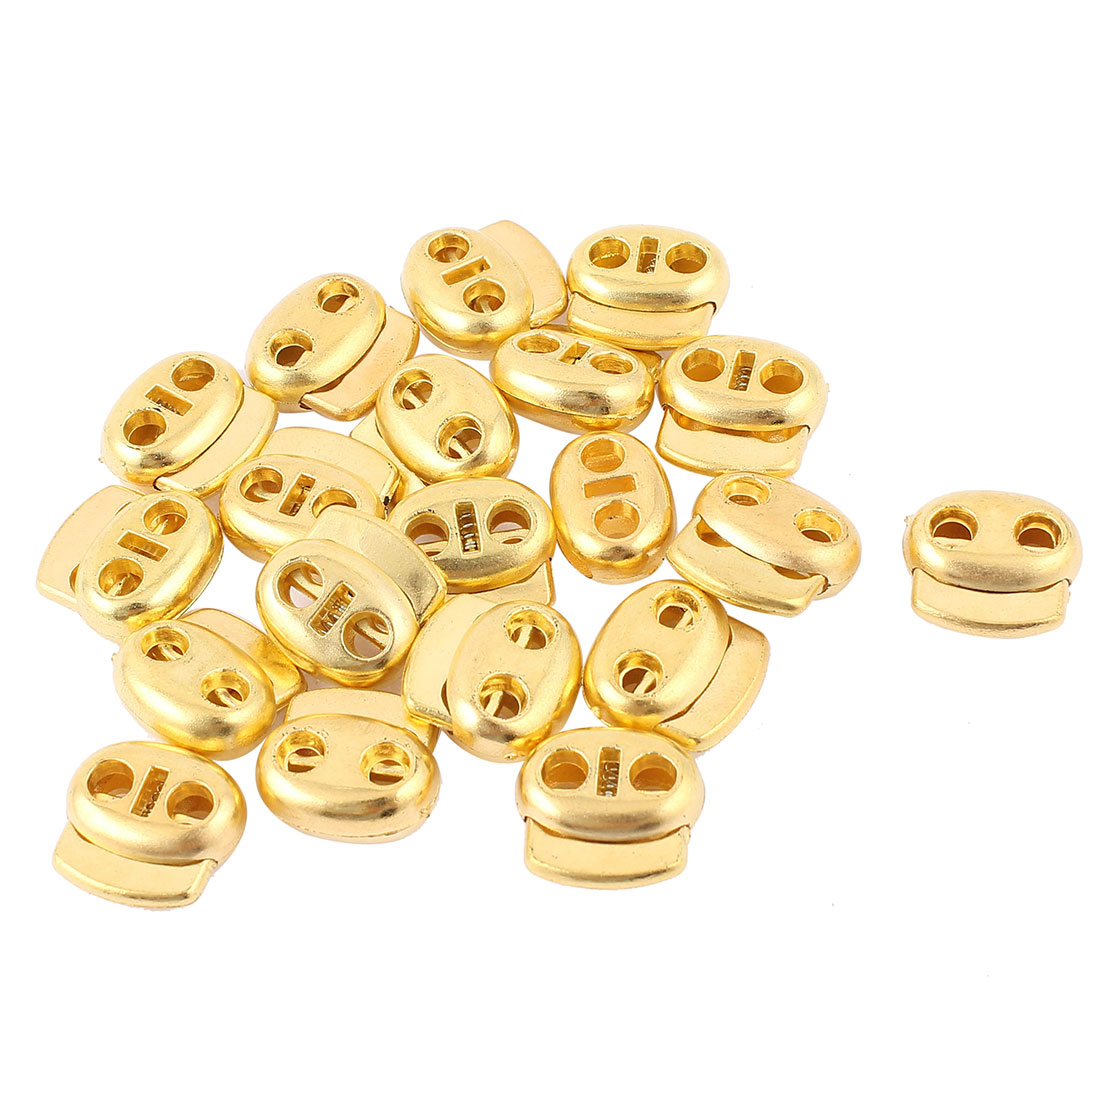 20 Pcs Dual Holes Cord Lock Stopper Toggles Spring Adjuster Fastener Gold Tone